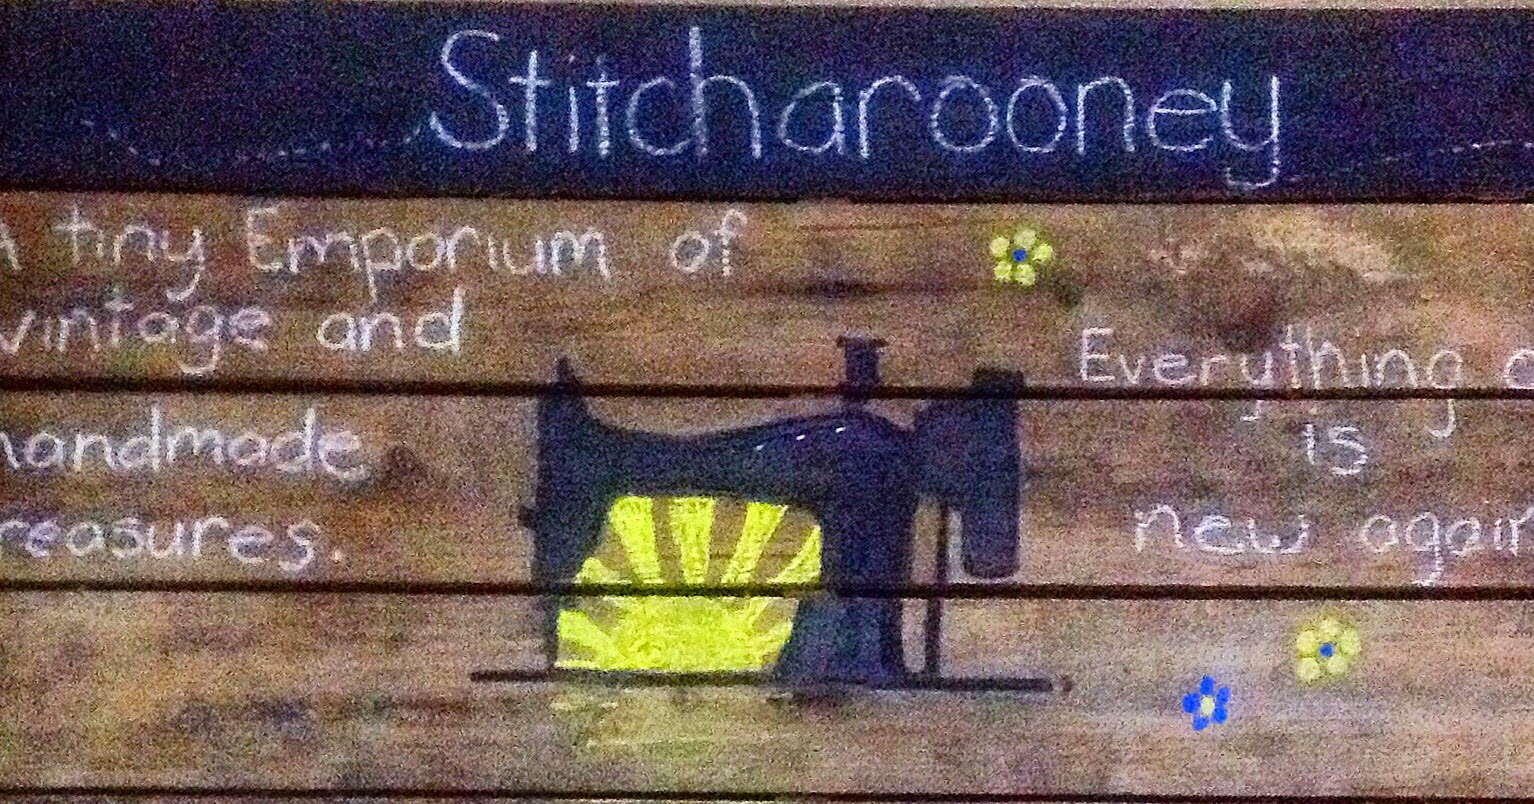 Stitcharooney